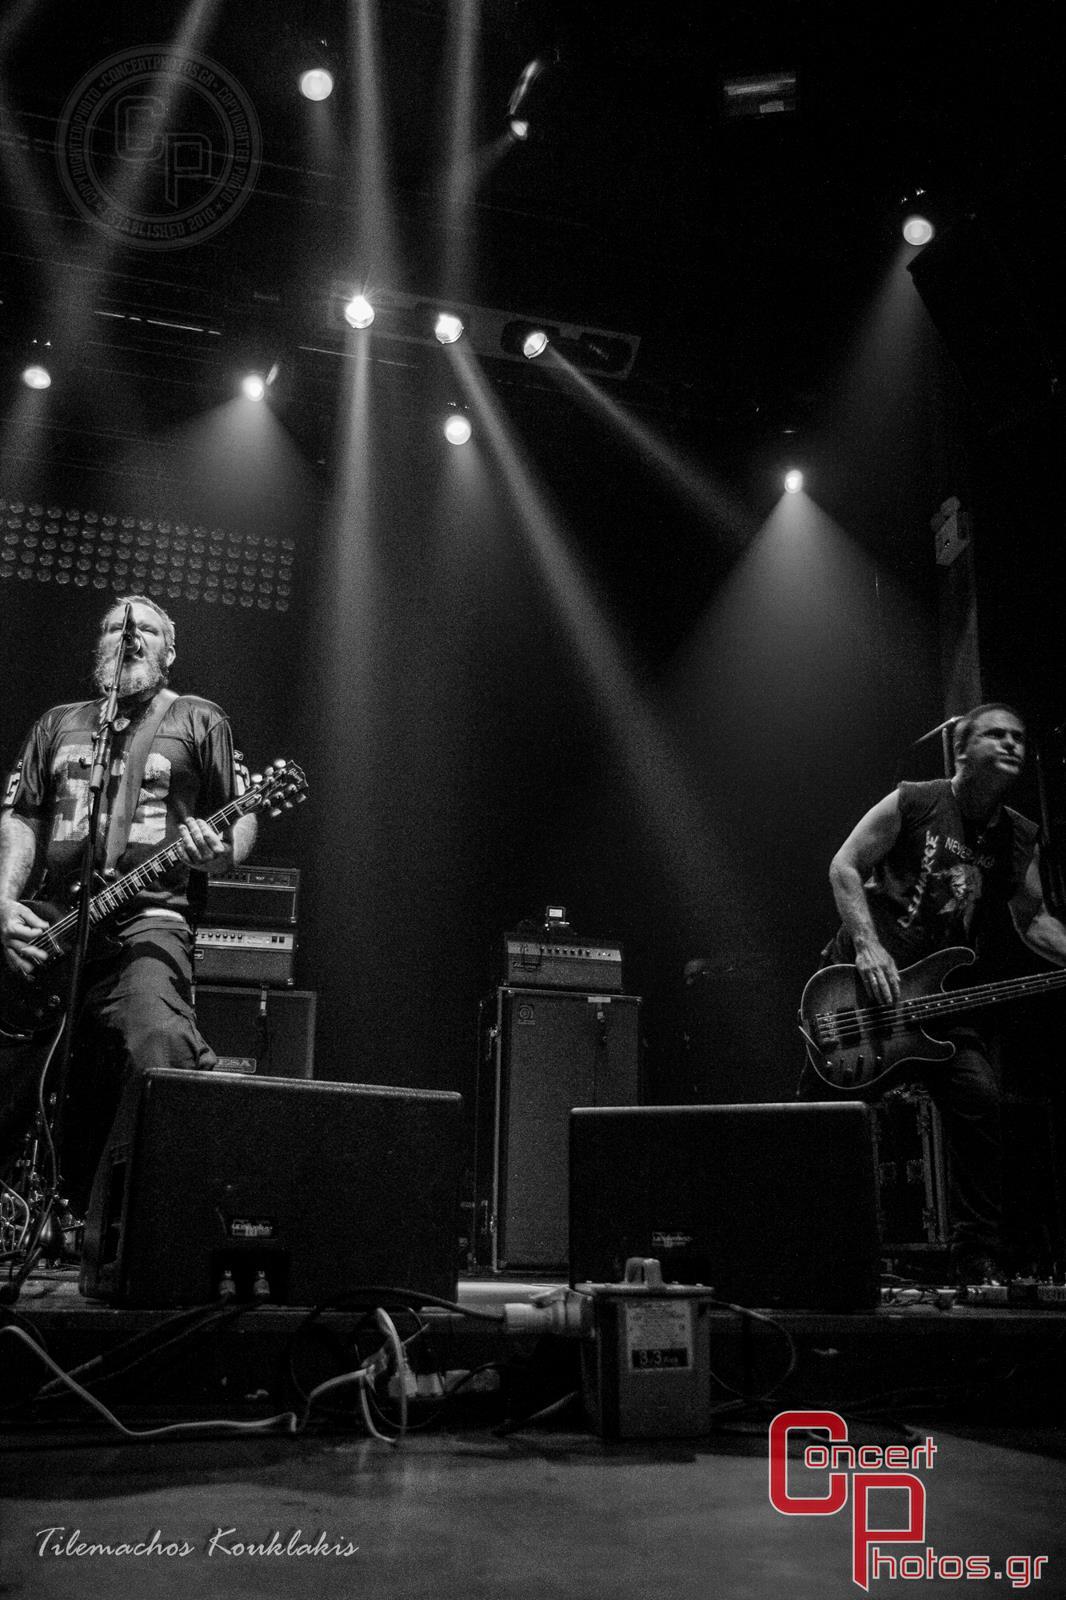 Neurosis-Neurosis photographer:  - concertphotos_20140707_23_56_35-6